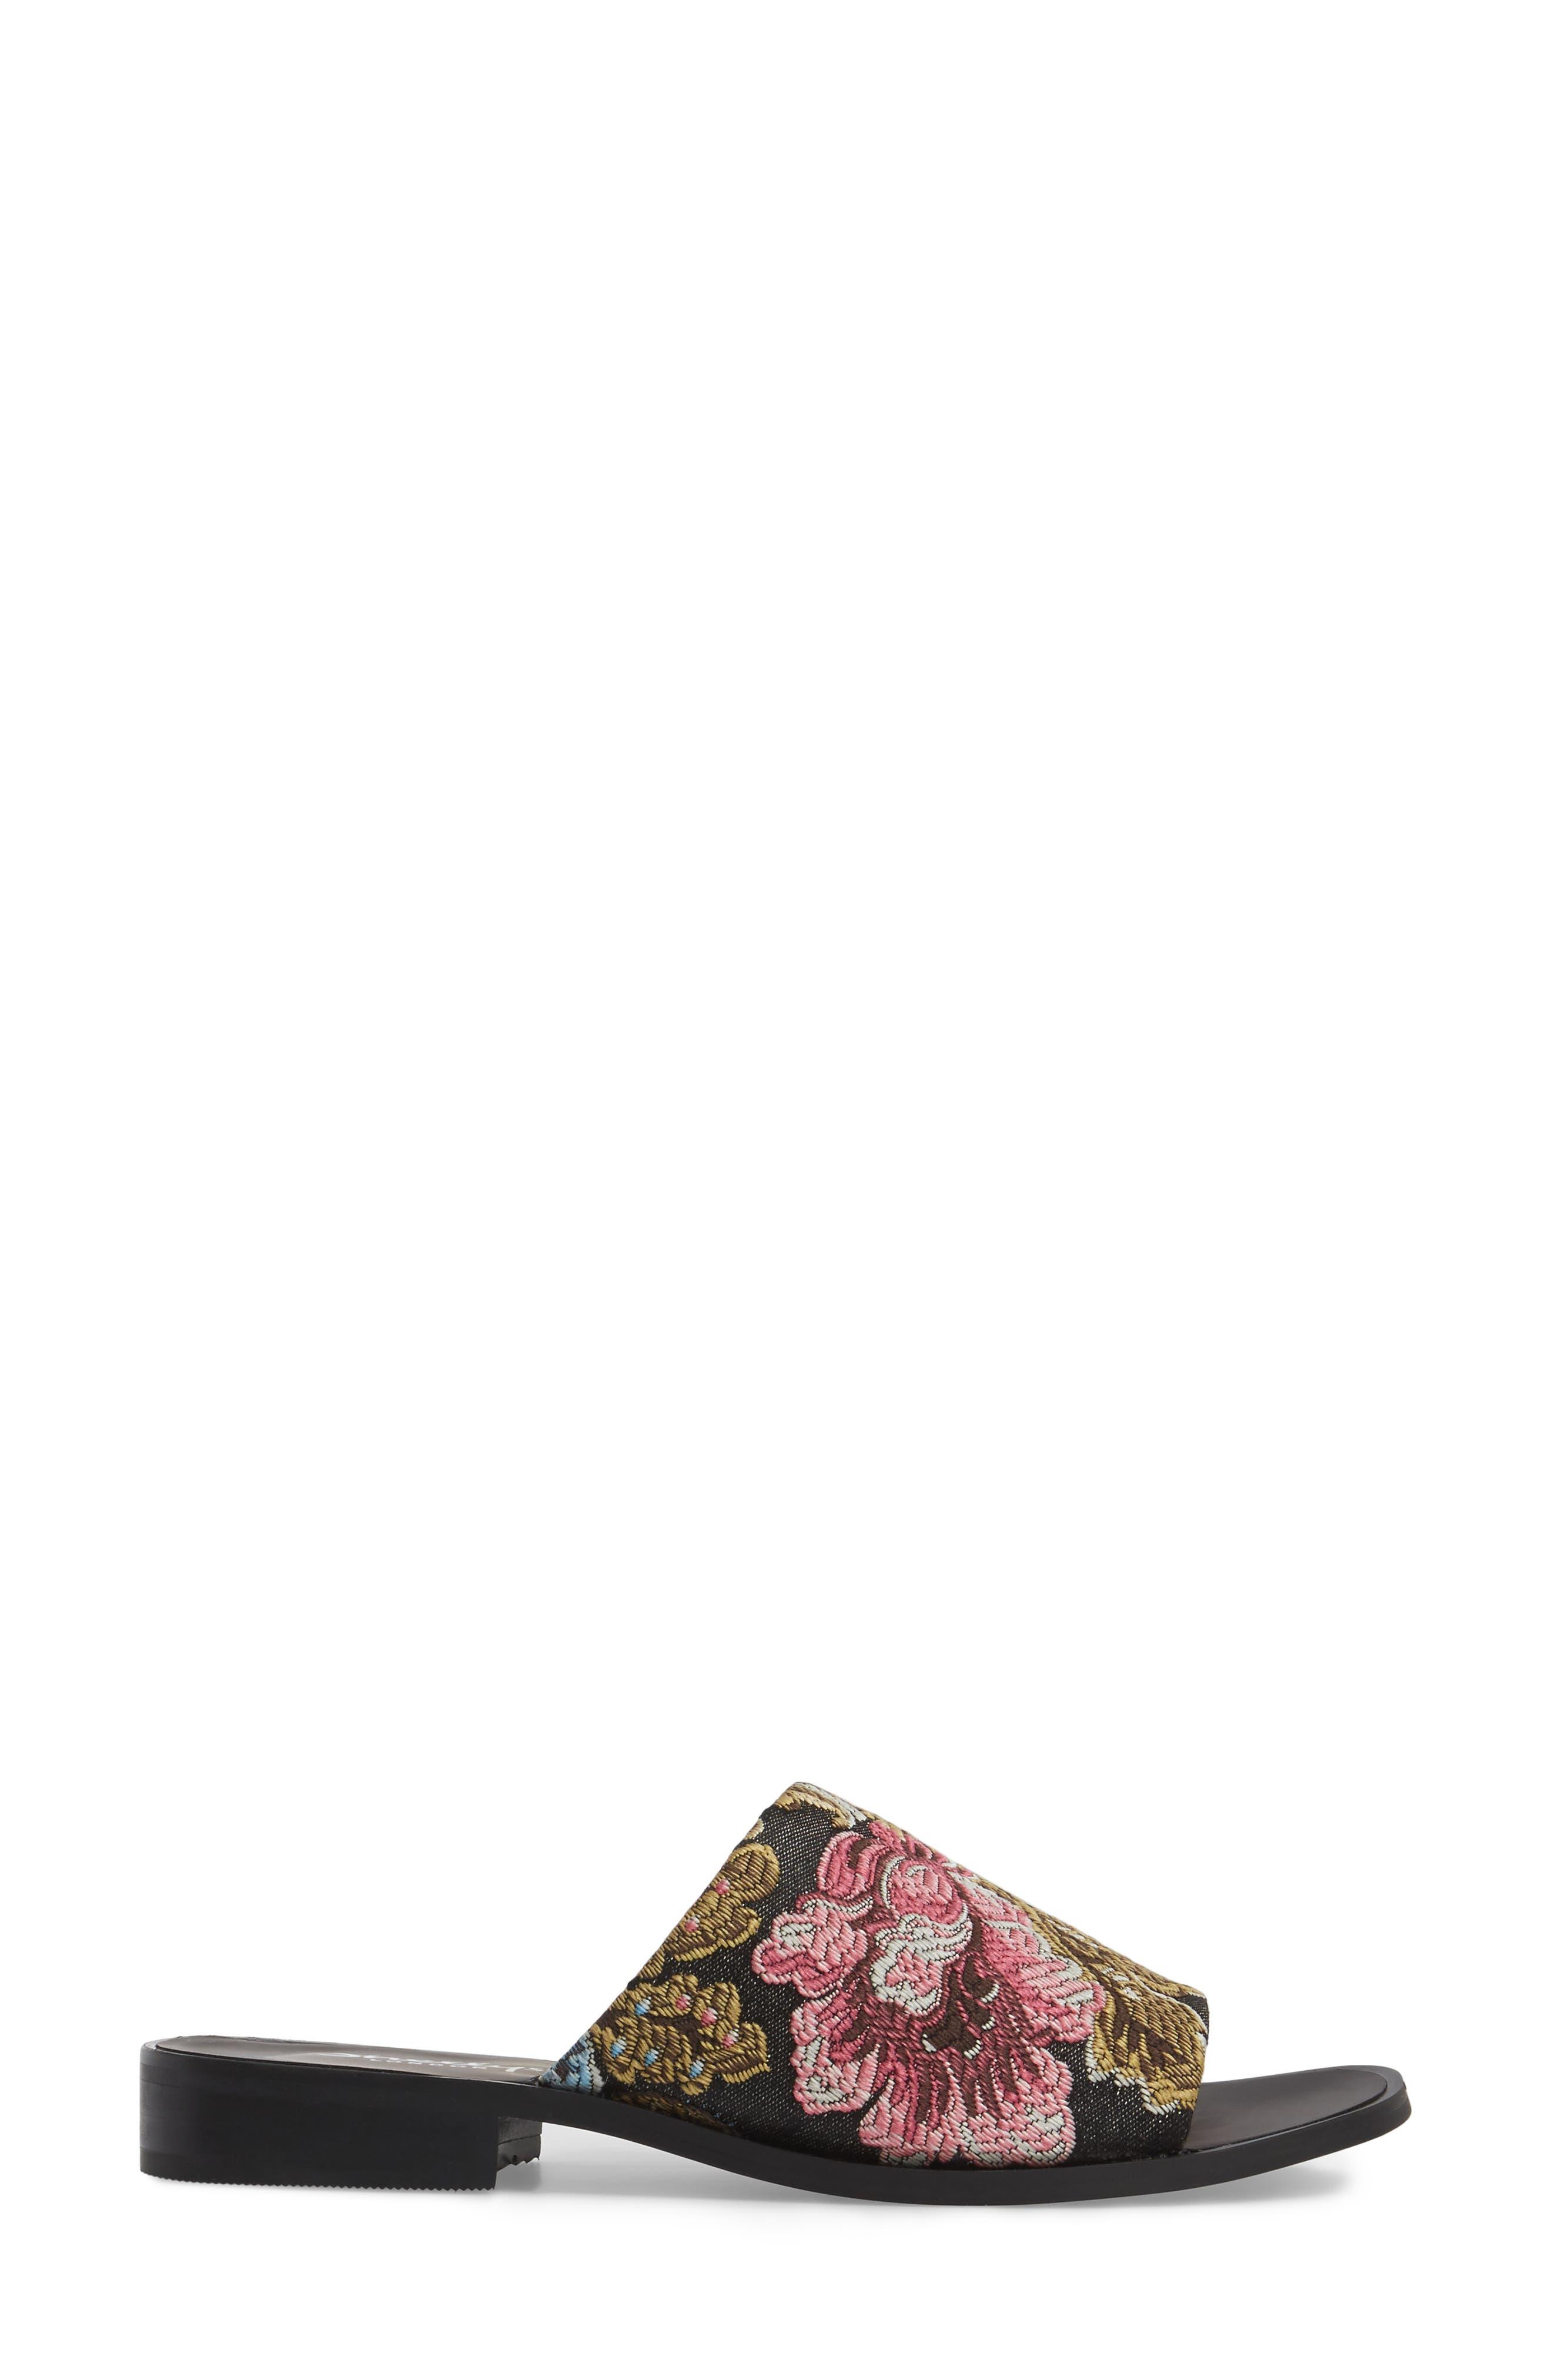 Enya Brocade Slide Sandal,                             Alternate thumbnail 3, color,                             001